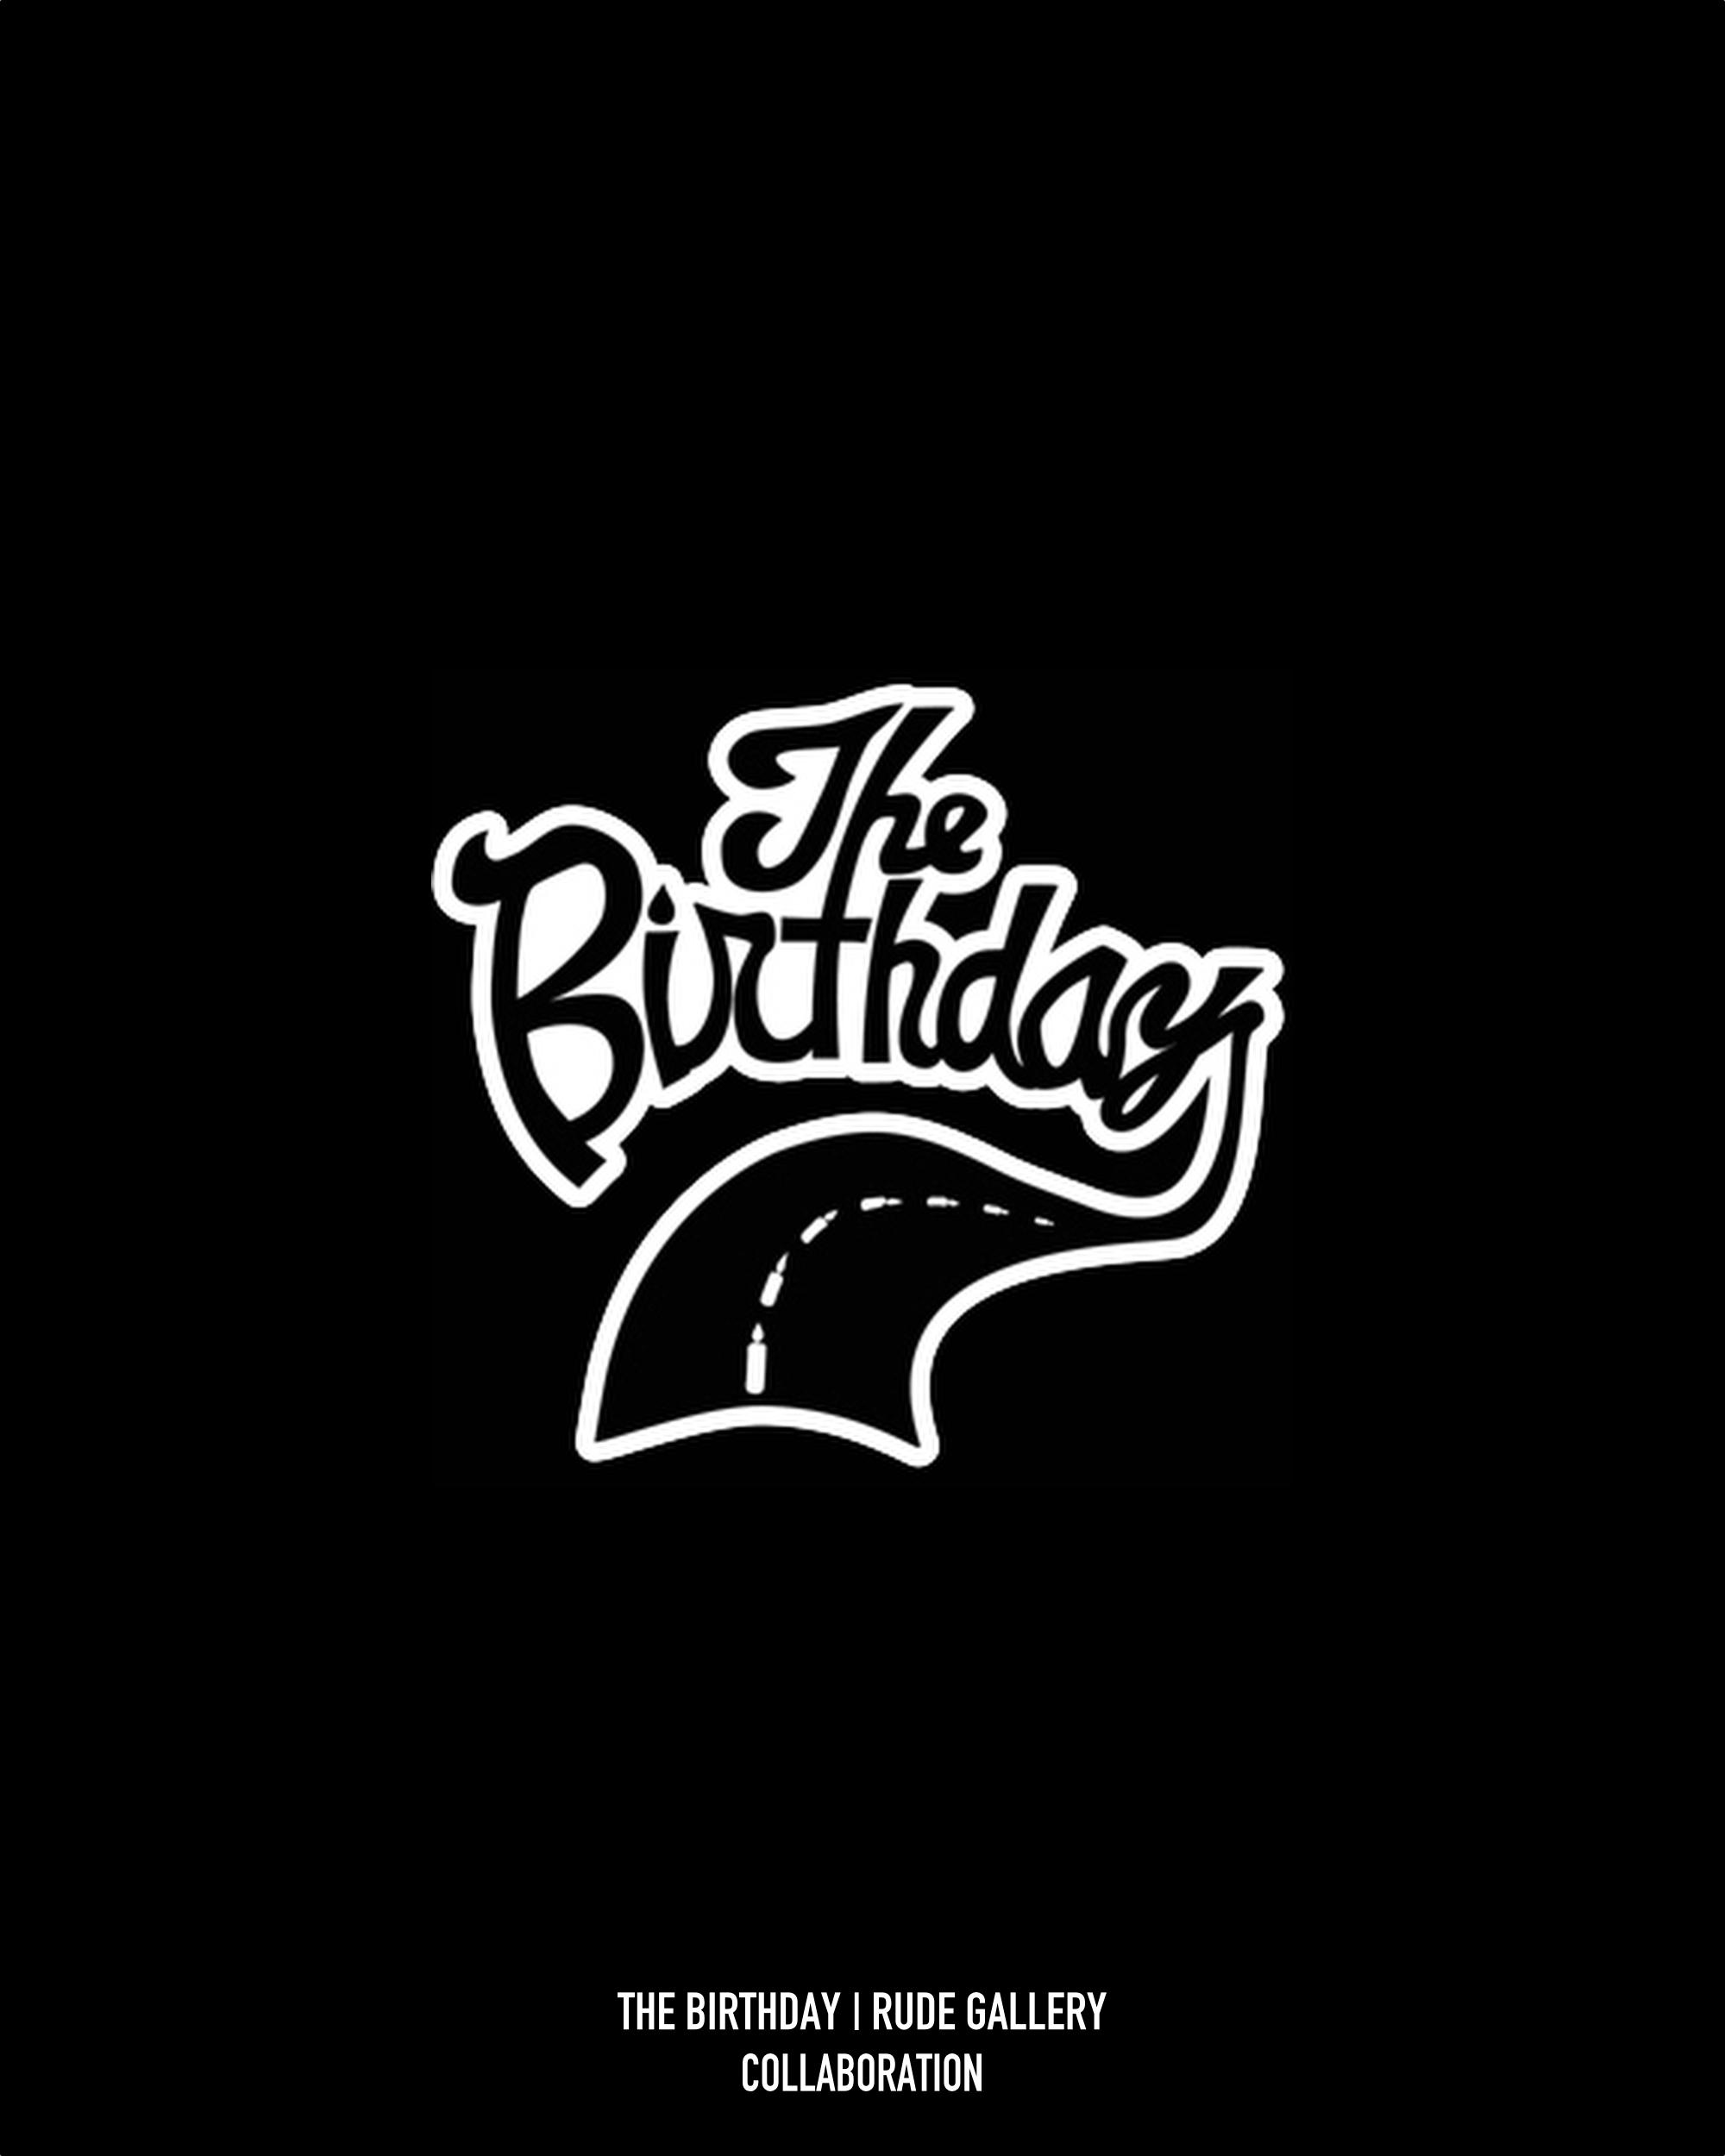 THEBIRTHDAY(4X5)